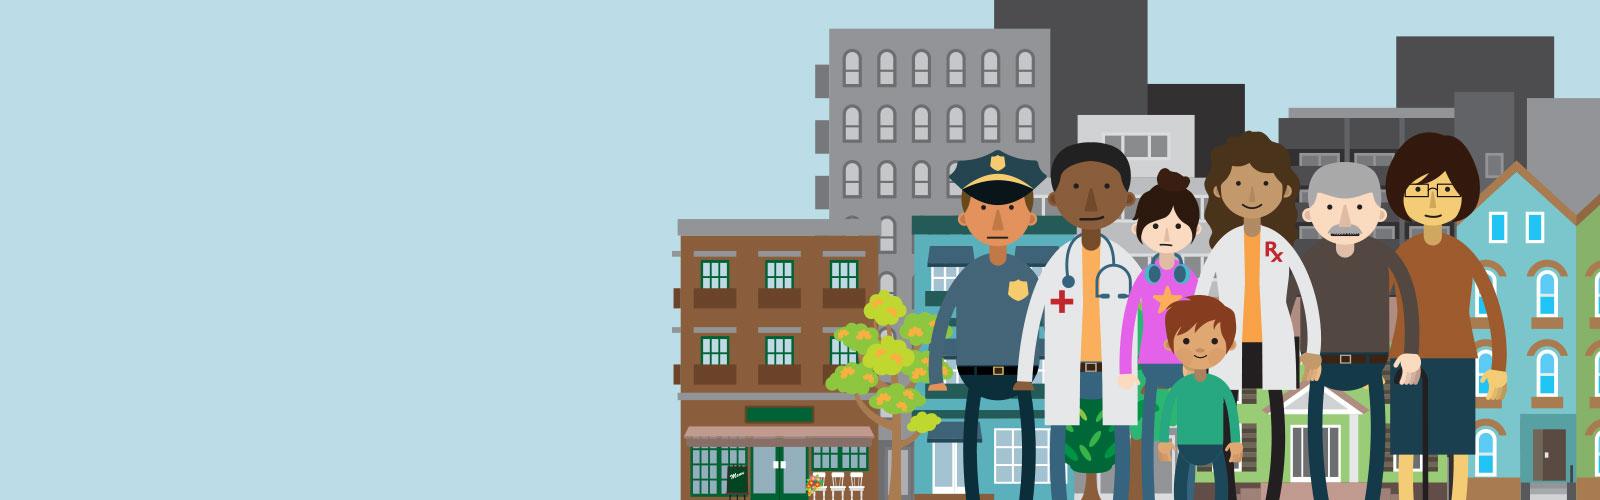 Illustration of GenerationRx community members in a city.